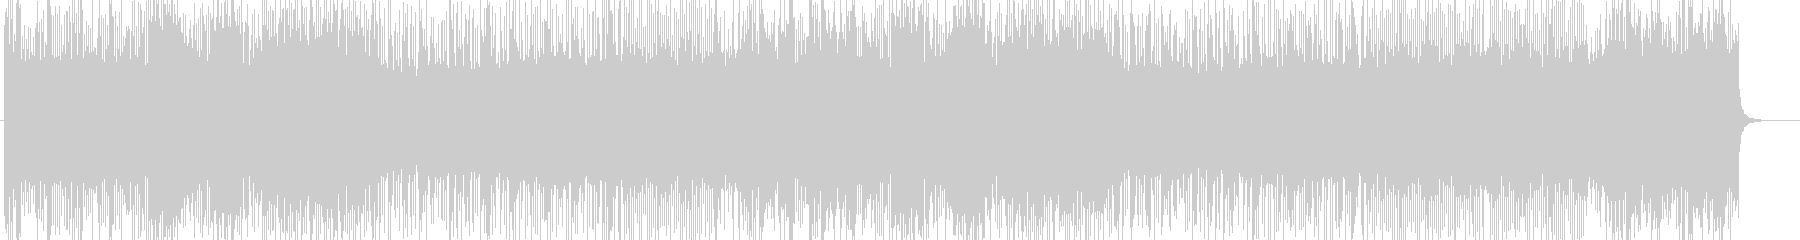 「HR/HM」「DARK」BGM148の未再生の波形